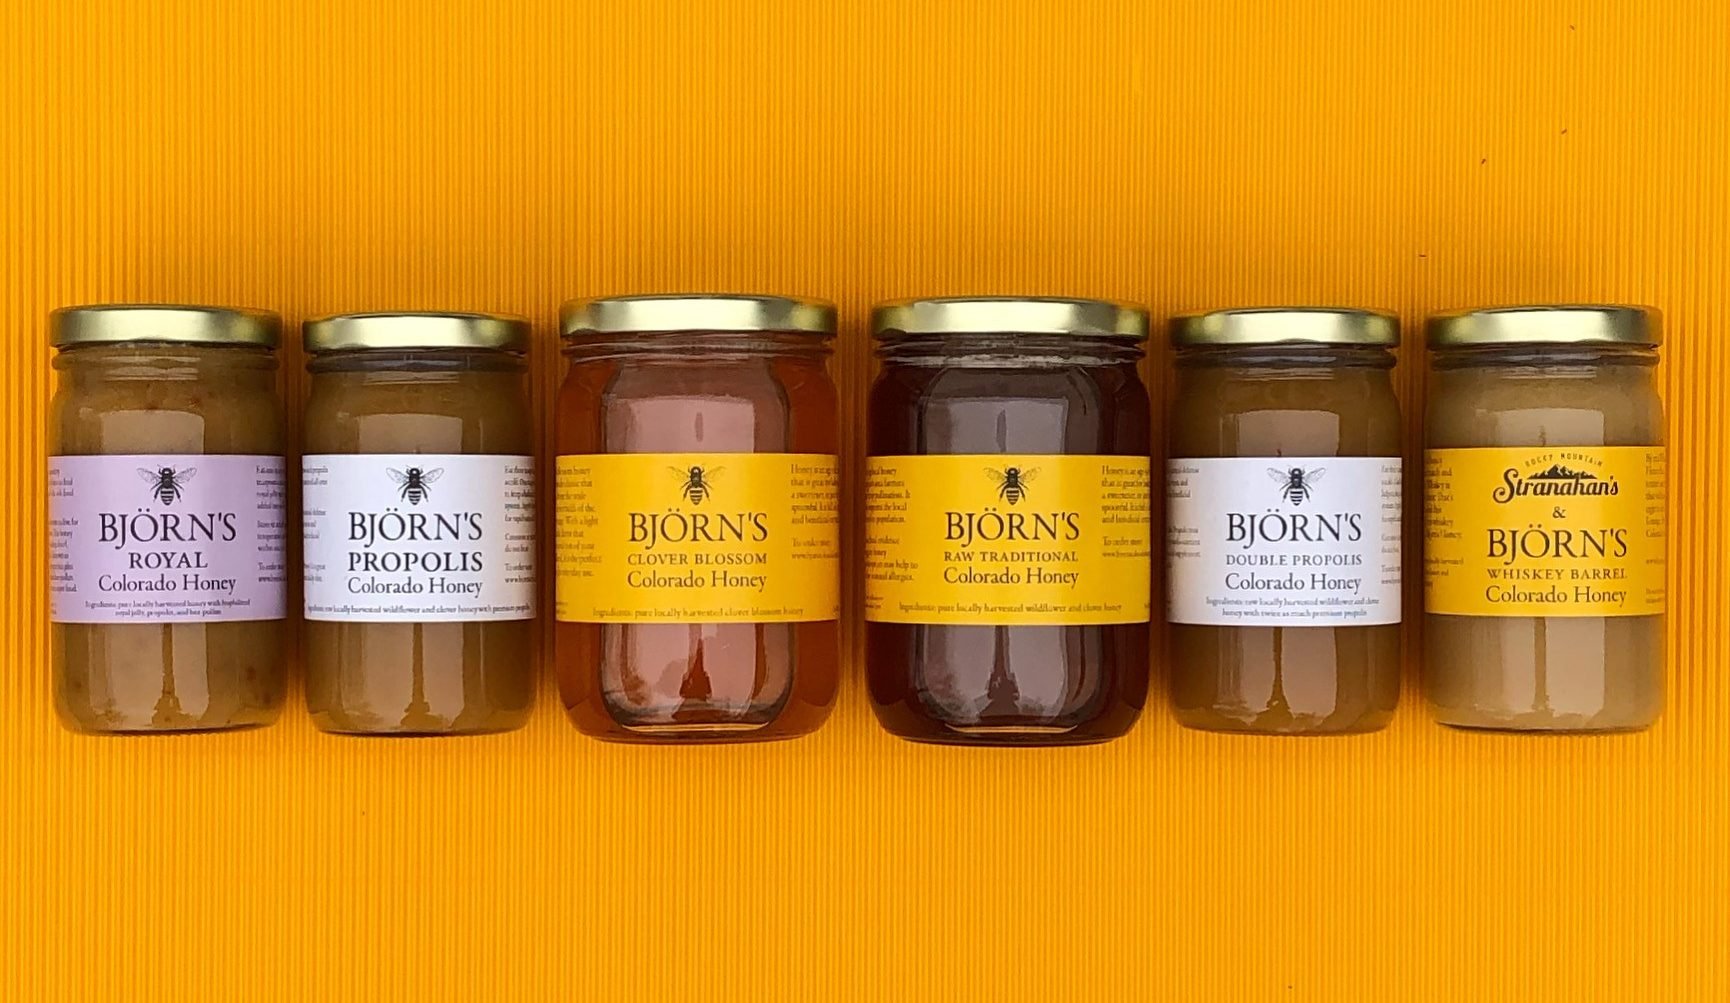 Bjorns Colorado Honey Selection of Honeys